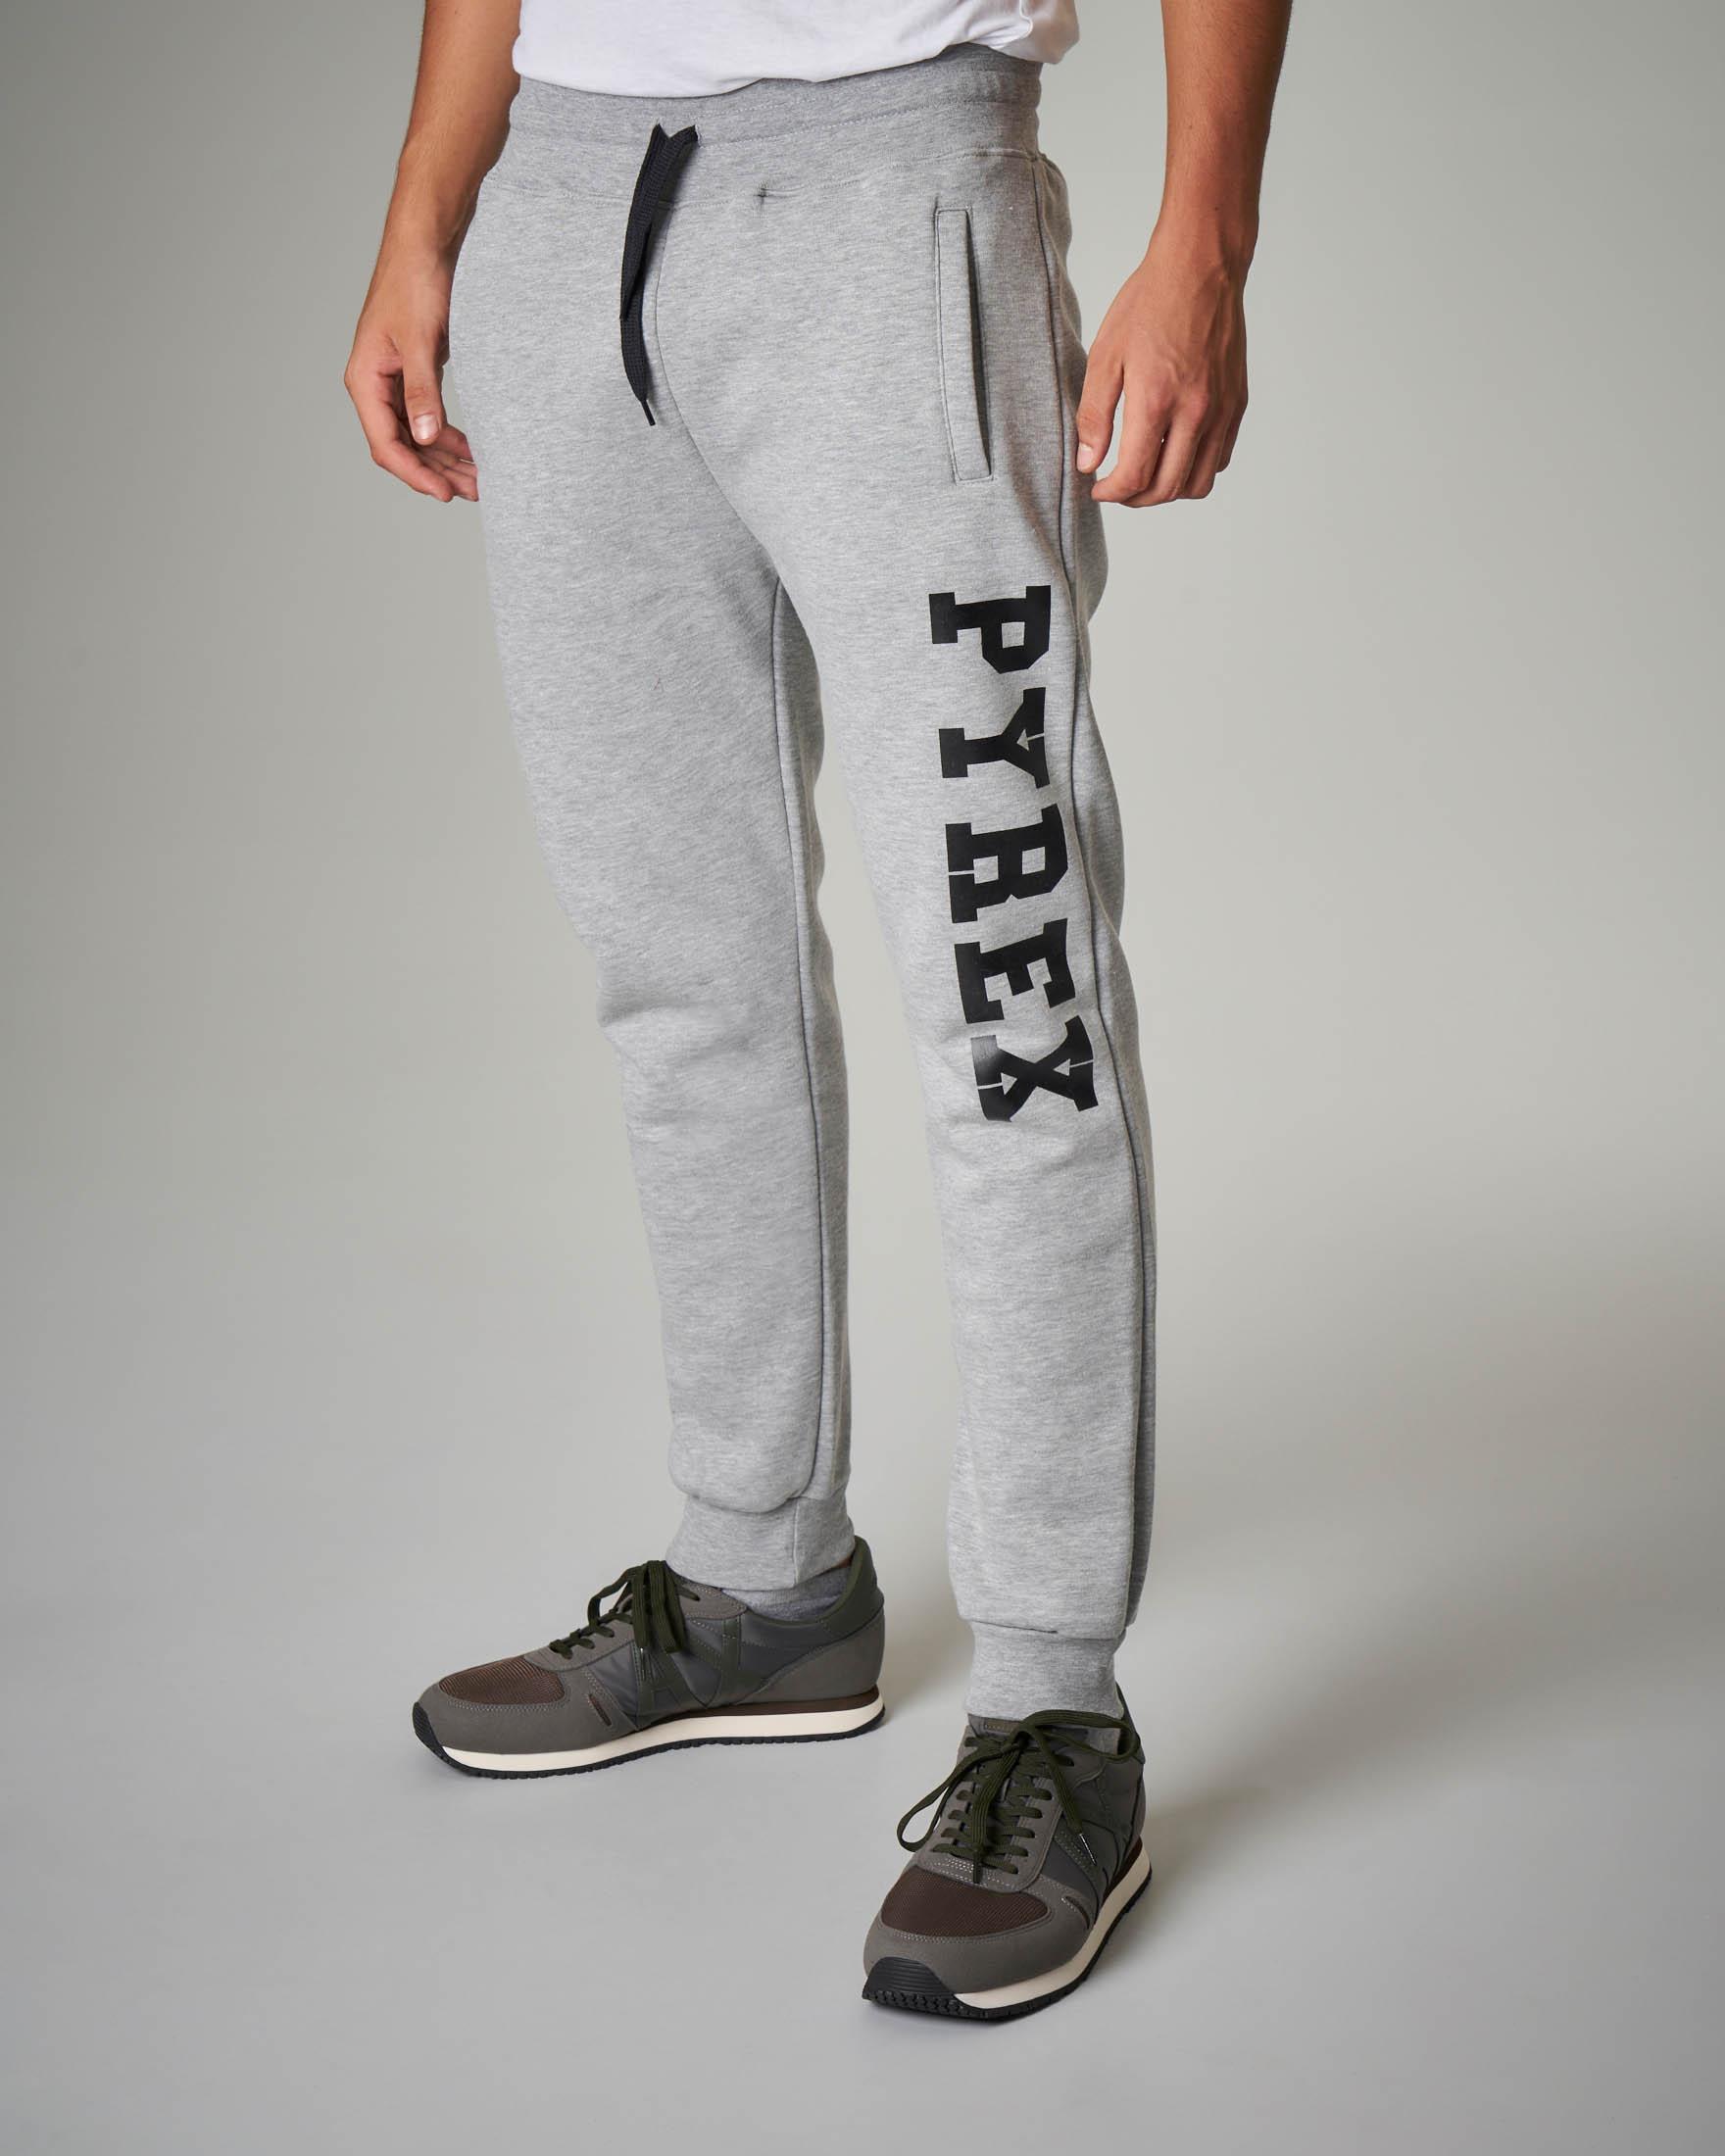 Pantalone grigio in felpa